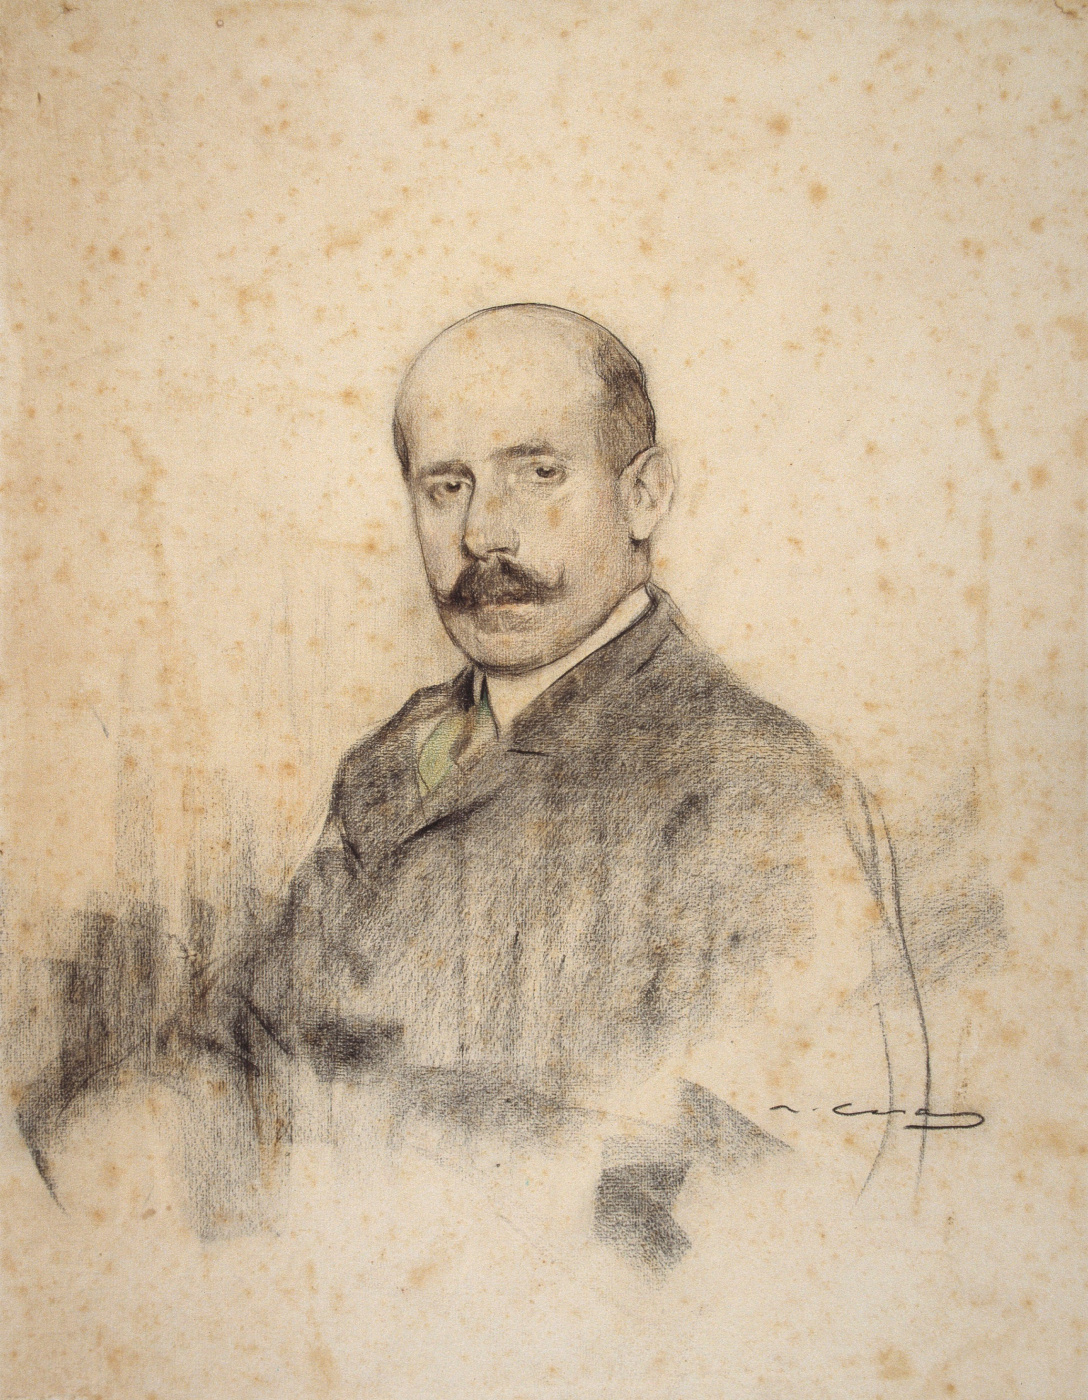 Ramon Casas i Carbó. Portrait of Ignacio Zuloagi